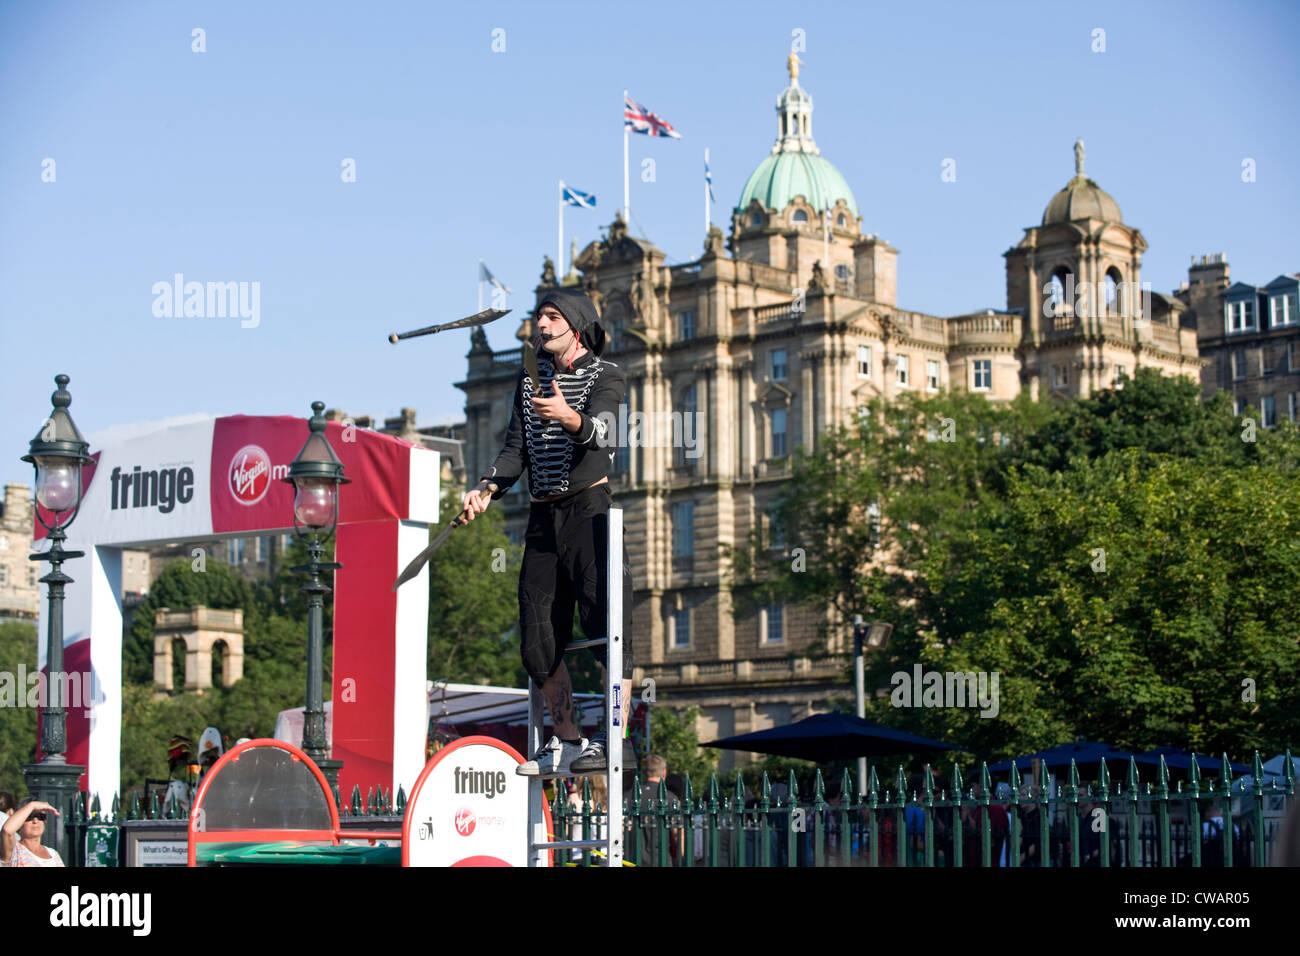 A Edinburgh fringe street busker juggling in front of the Bank of Scotland. - Stock Image